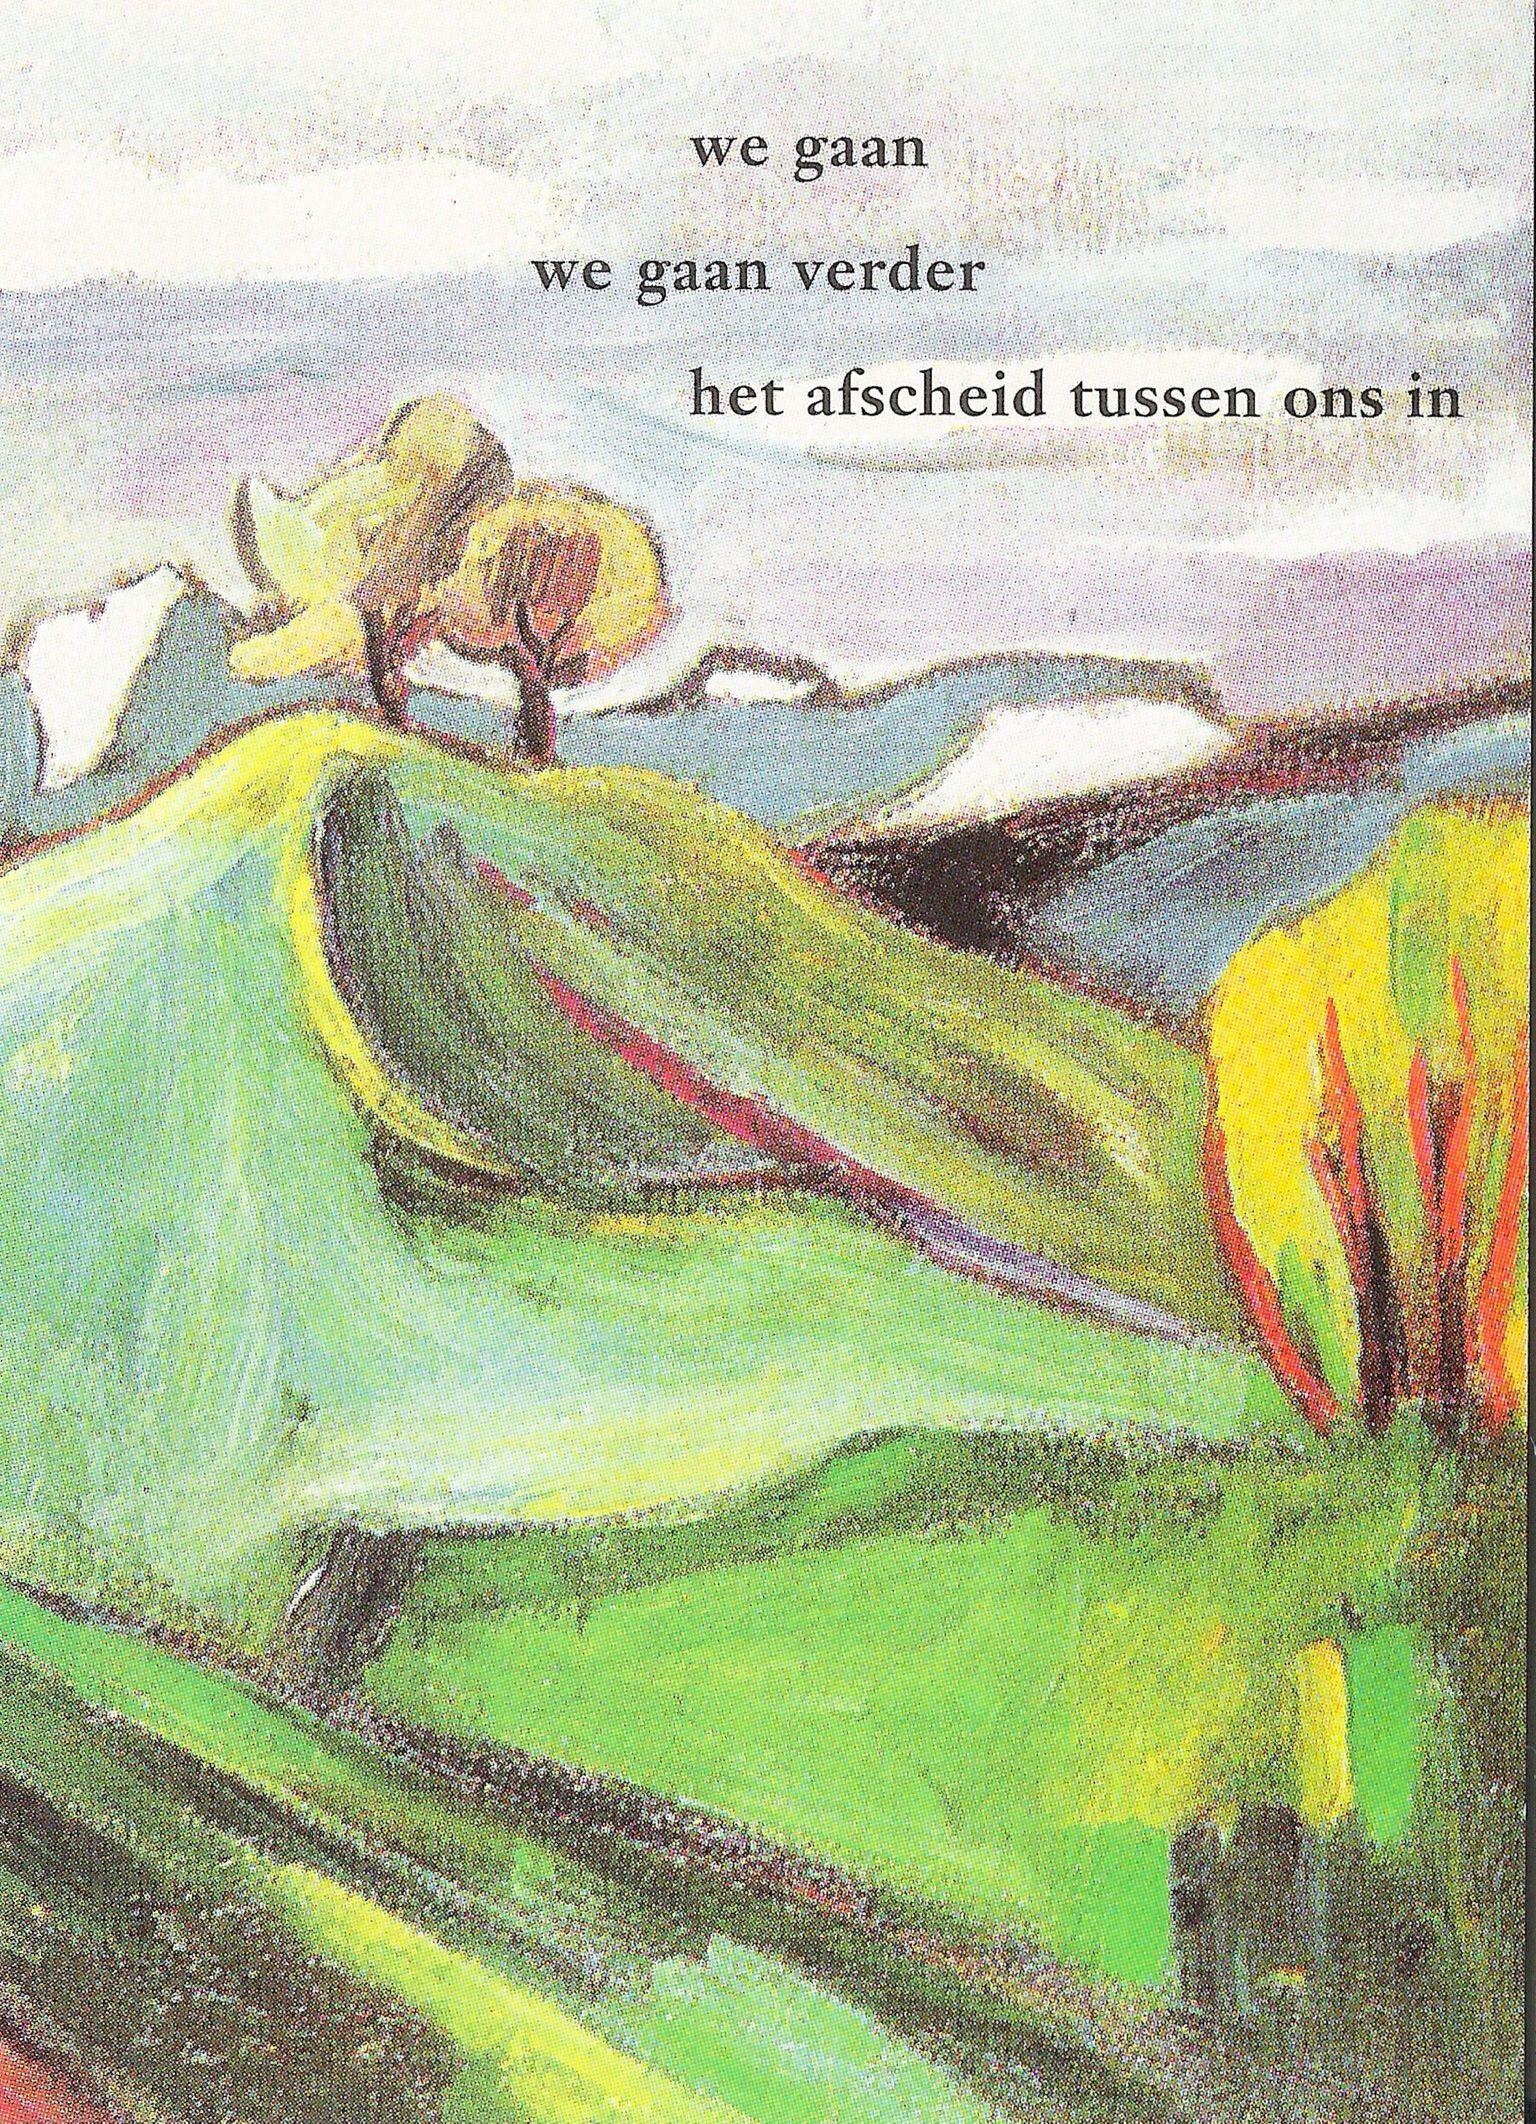 Beste Gedicht: Willem Hussem. Beeld: Helmuth Macke. (met afbeeldingen IE-65